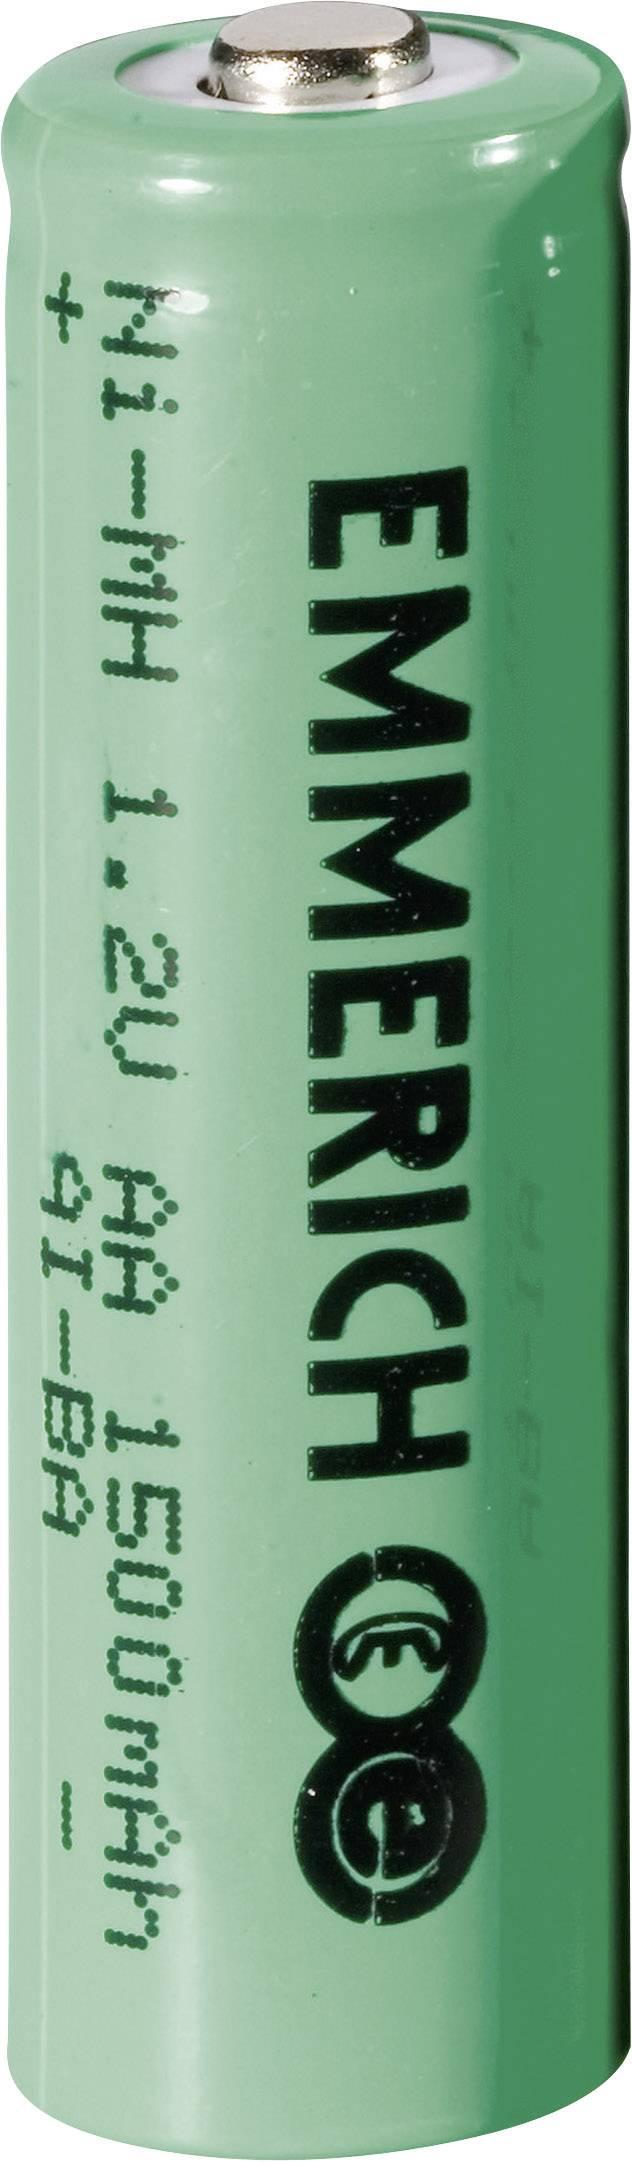 Tužkový akumulátor typu AA NiMH Emmerich HR06 255024, 1500 mAh, 1.2 V, 1 ks